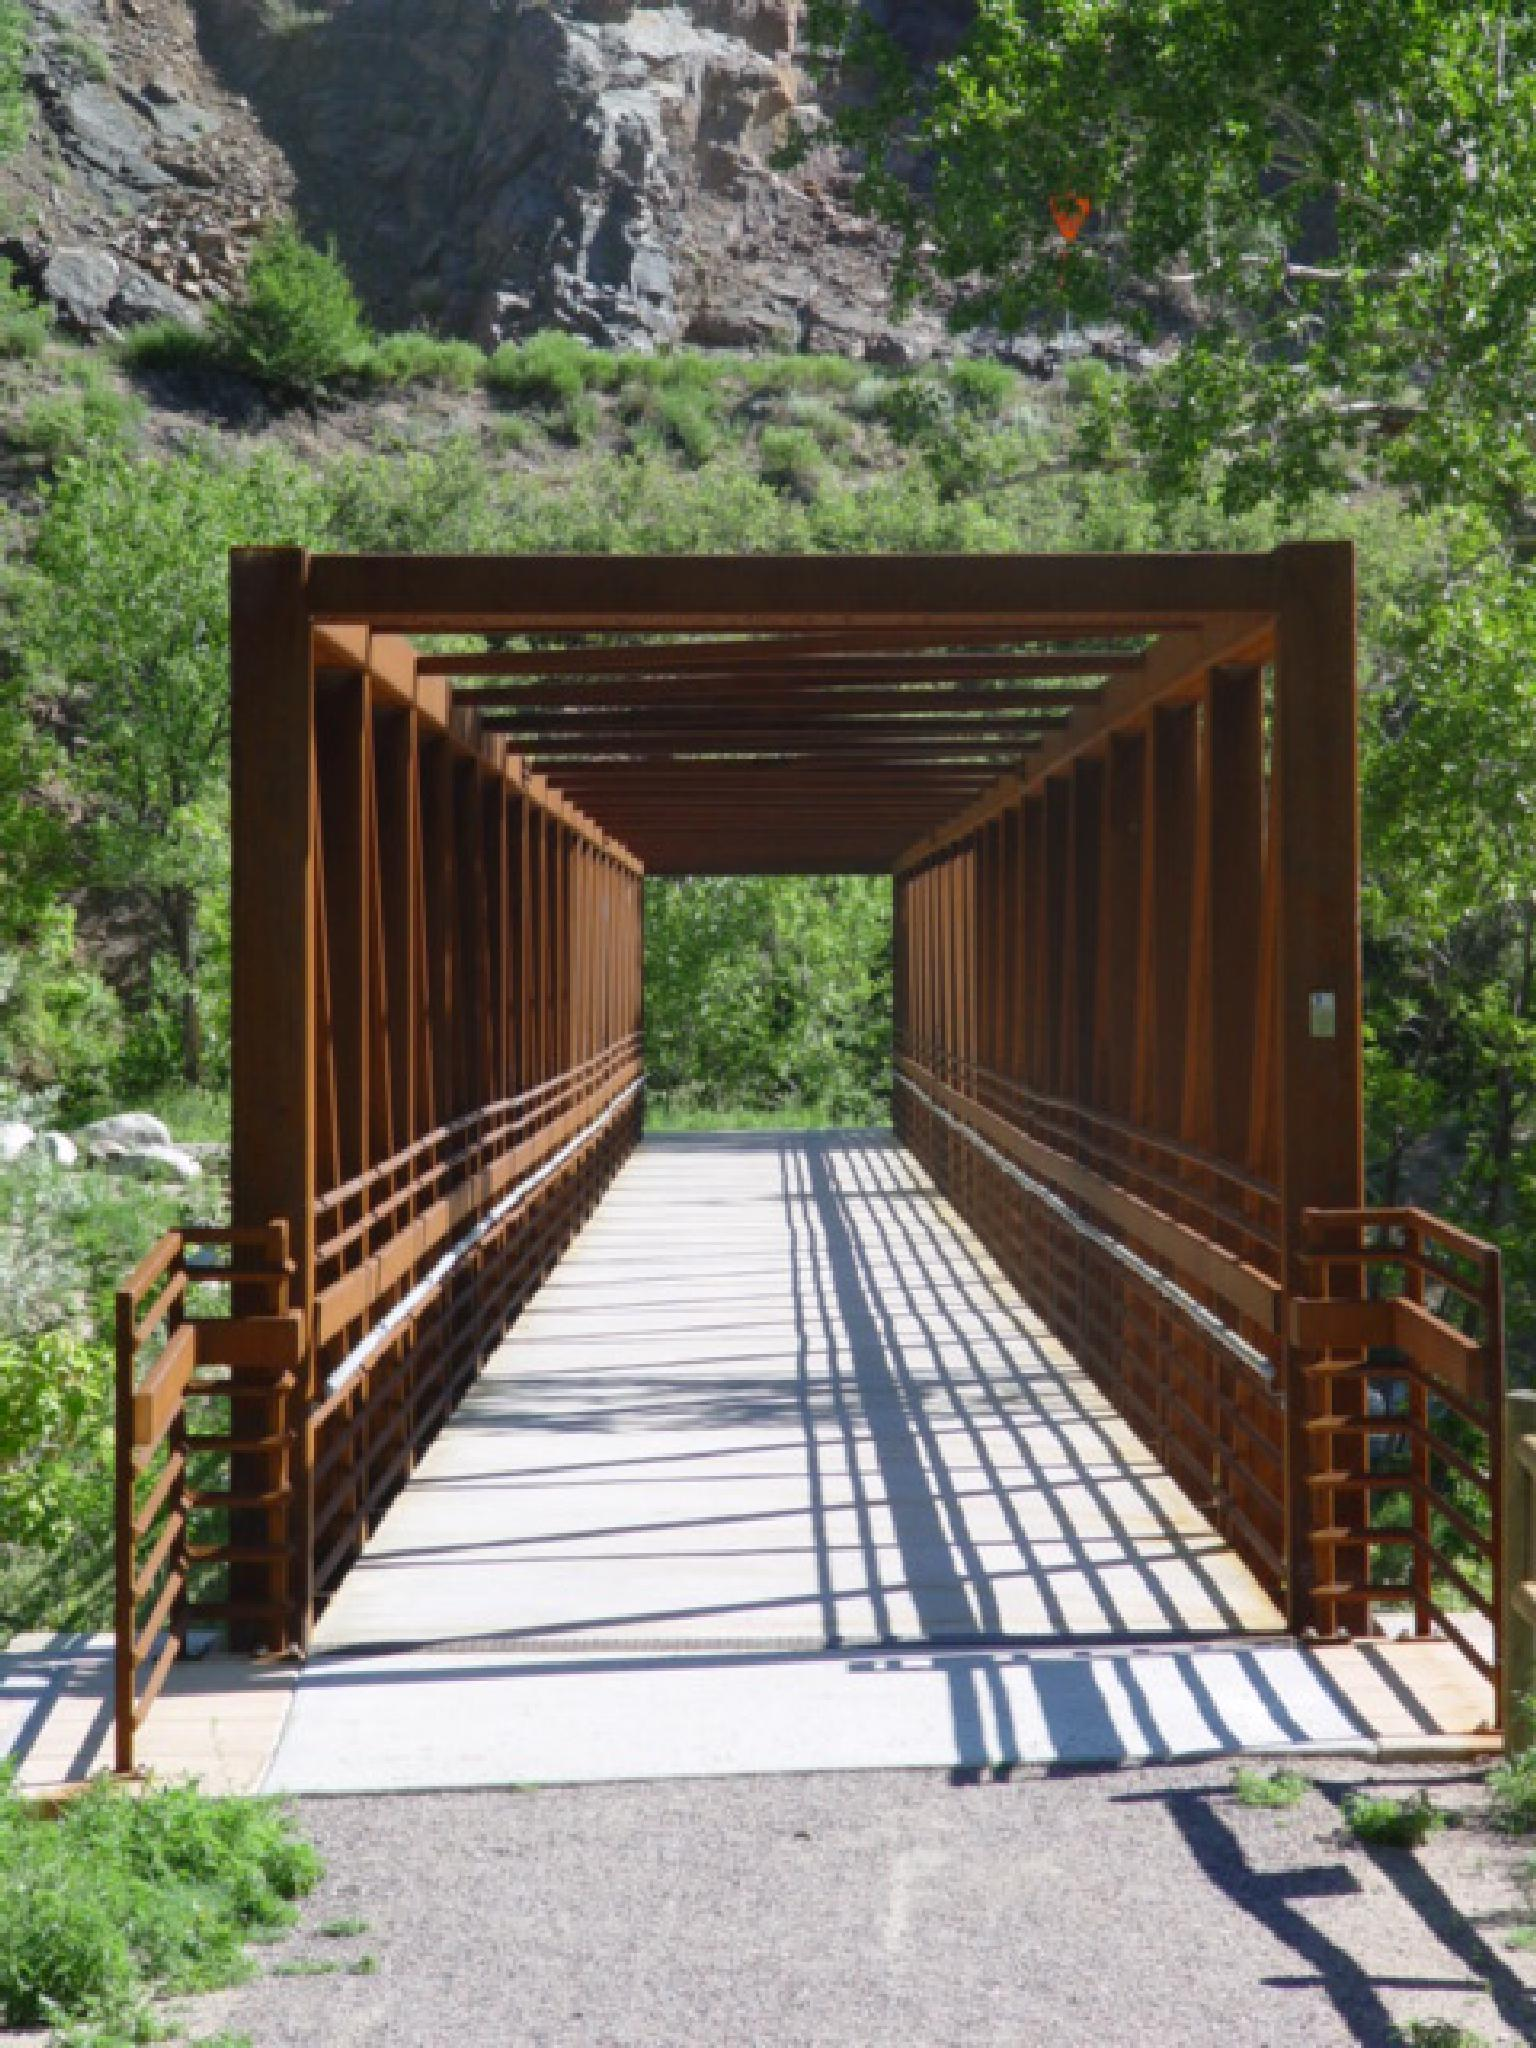 Bridge to Nowhere by Catherine Carver